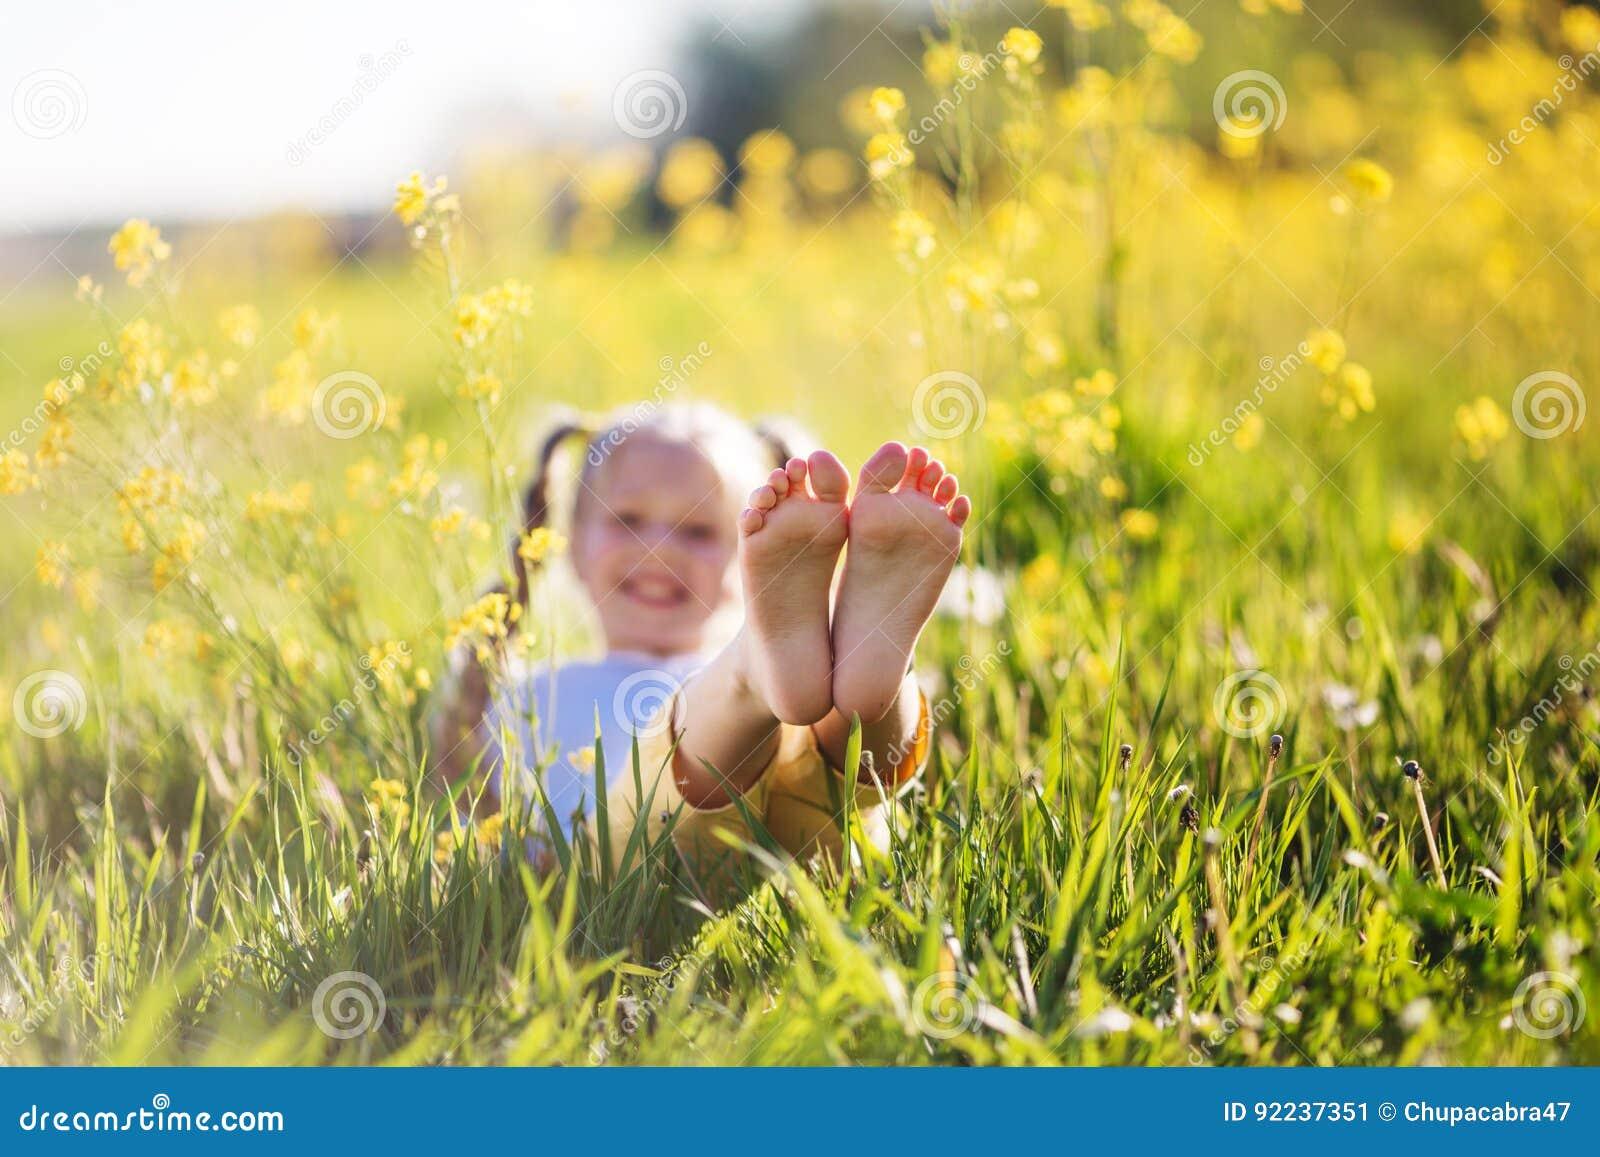 panties Feet Loes Fielt naked photo 2017